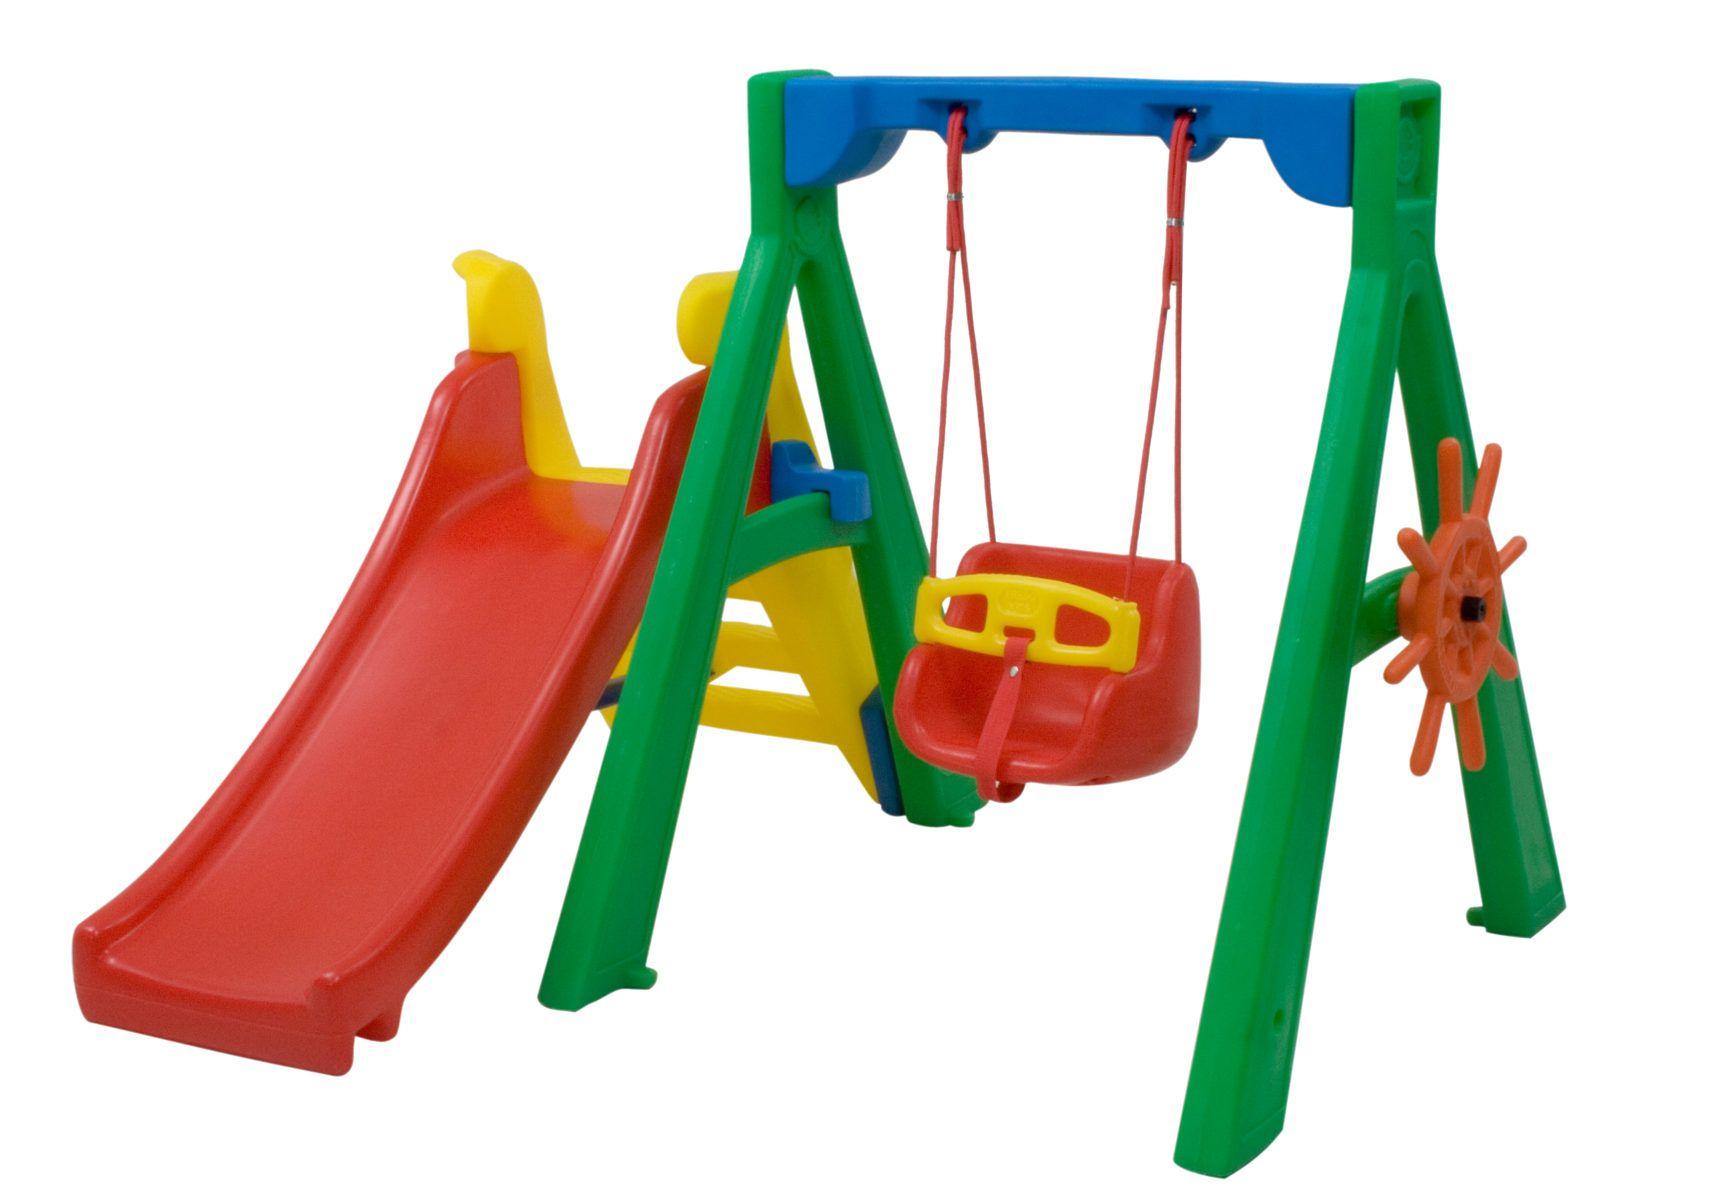 Baby Play + Balanço Bebê | 1m65 x 1m52 x 1m20 | 9 meses a 3 anos